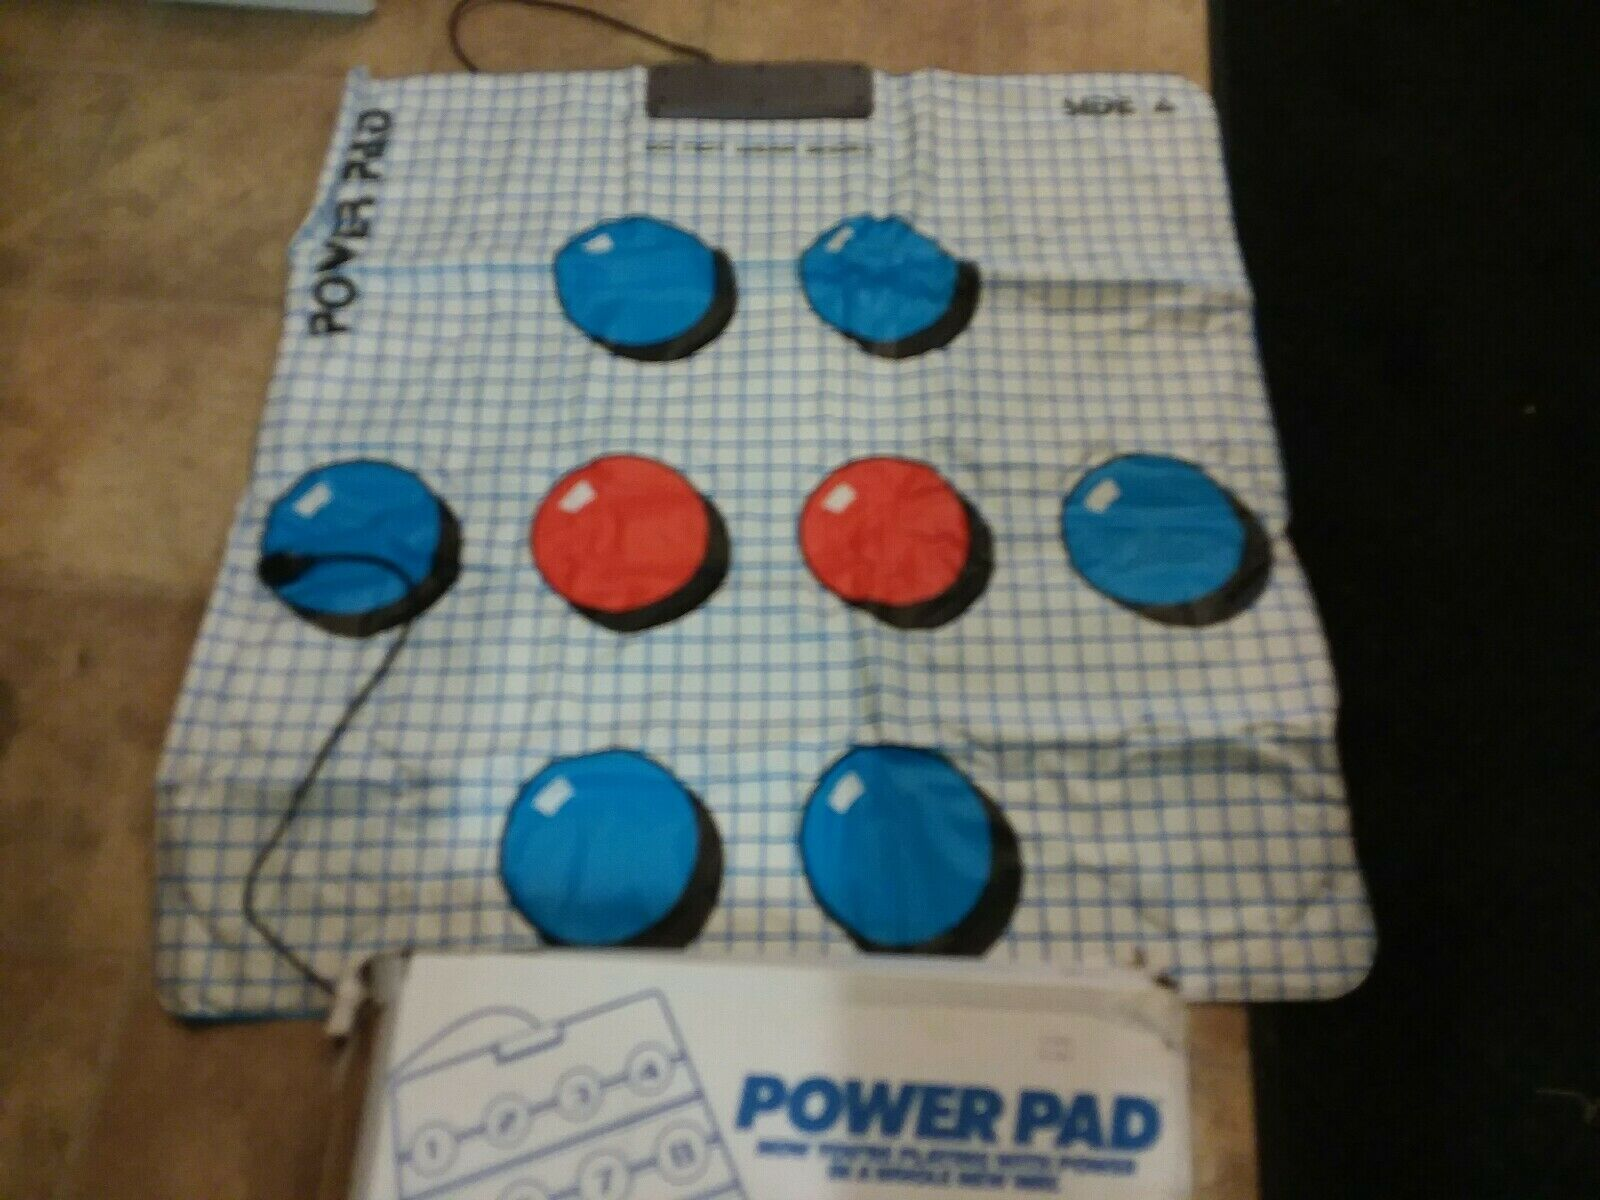 Vintage 1988 Original Nes Nintendo Power Pad Accessory Controller Running Mat  - $40.00